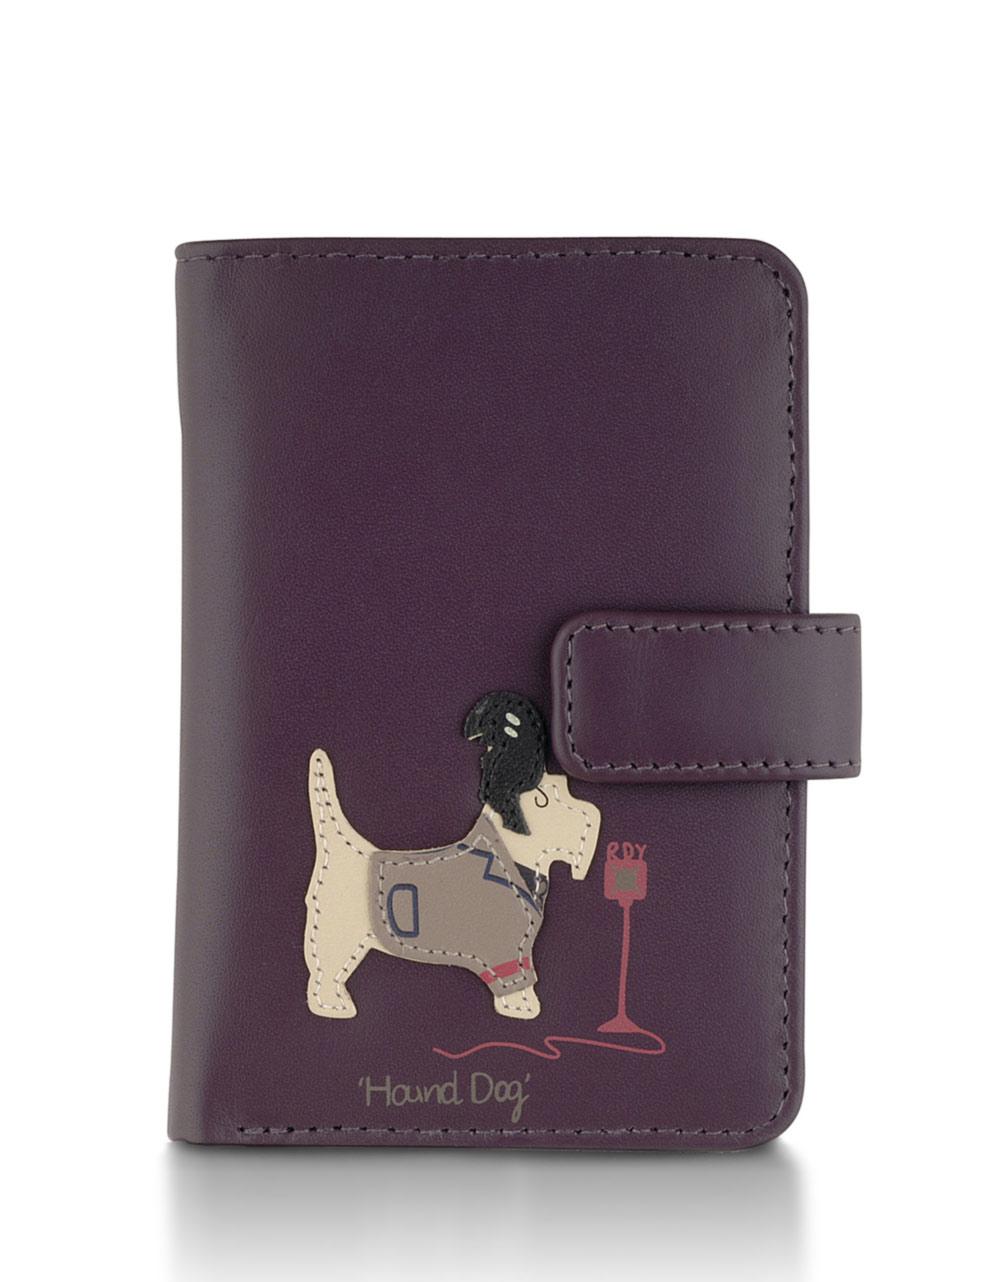 Fantastic Radley Business Card Holder Gallery - Business Card Ideas ...